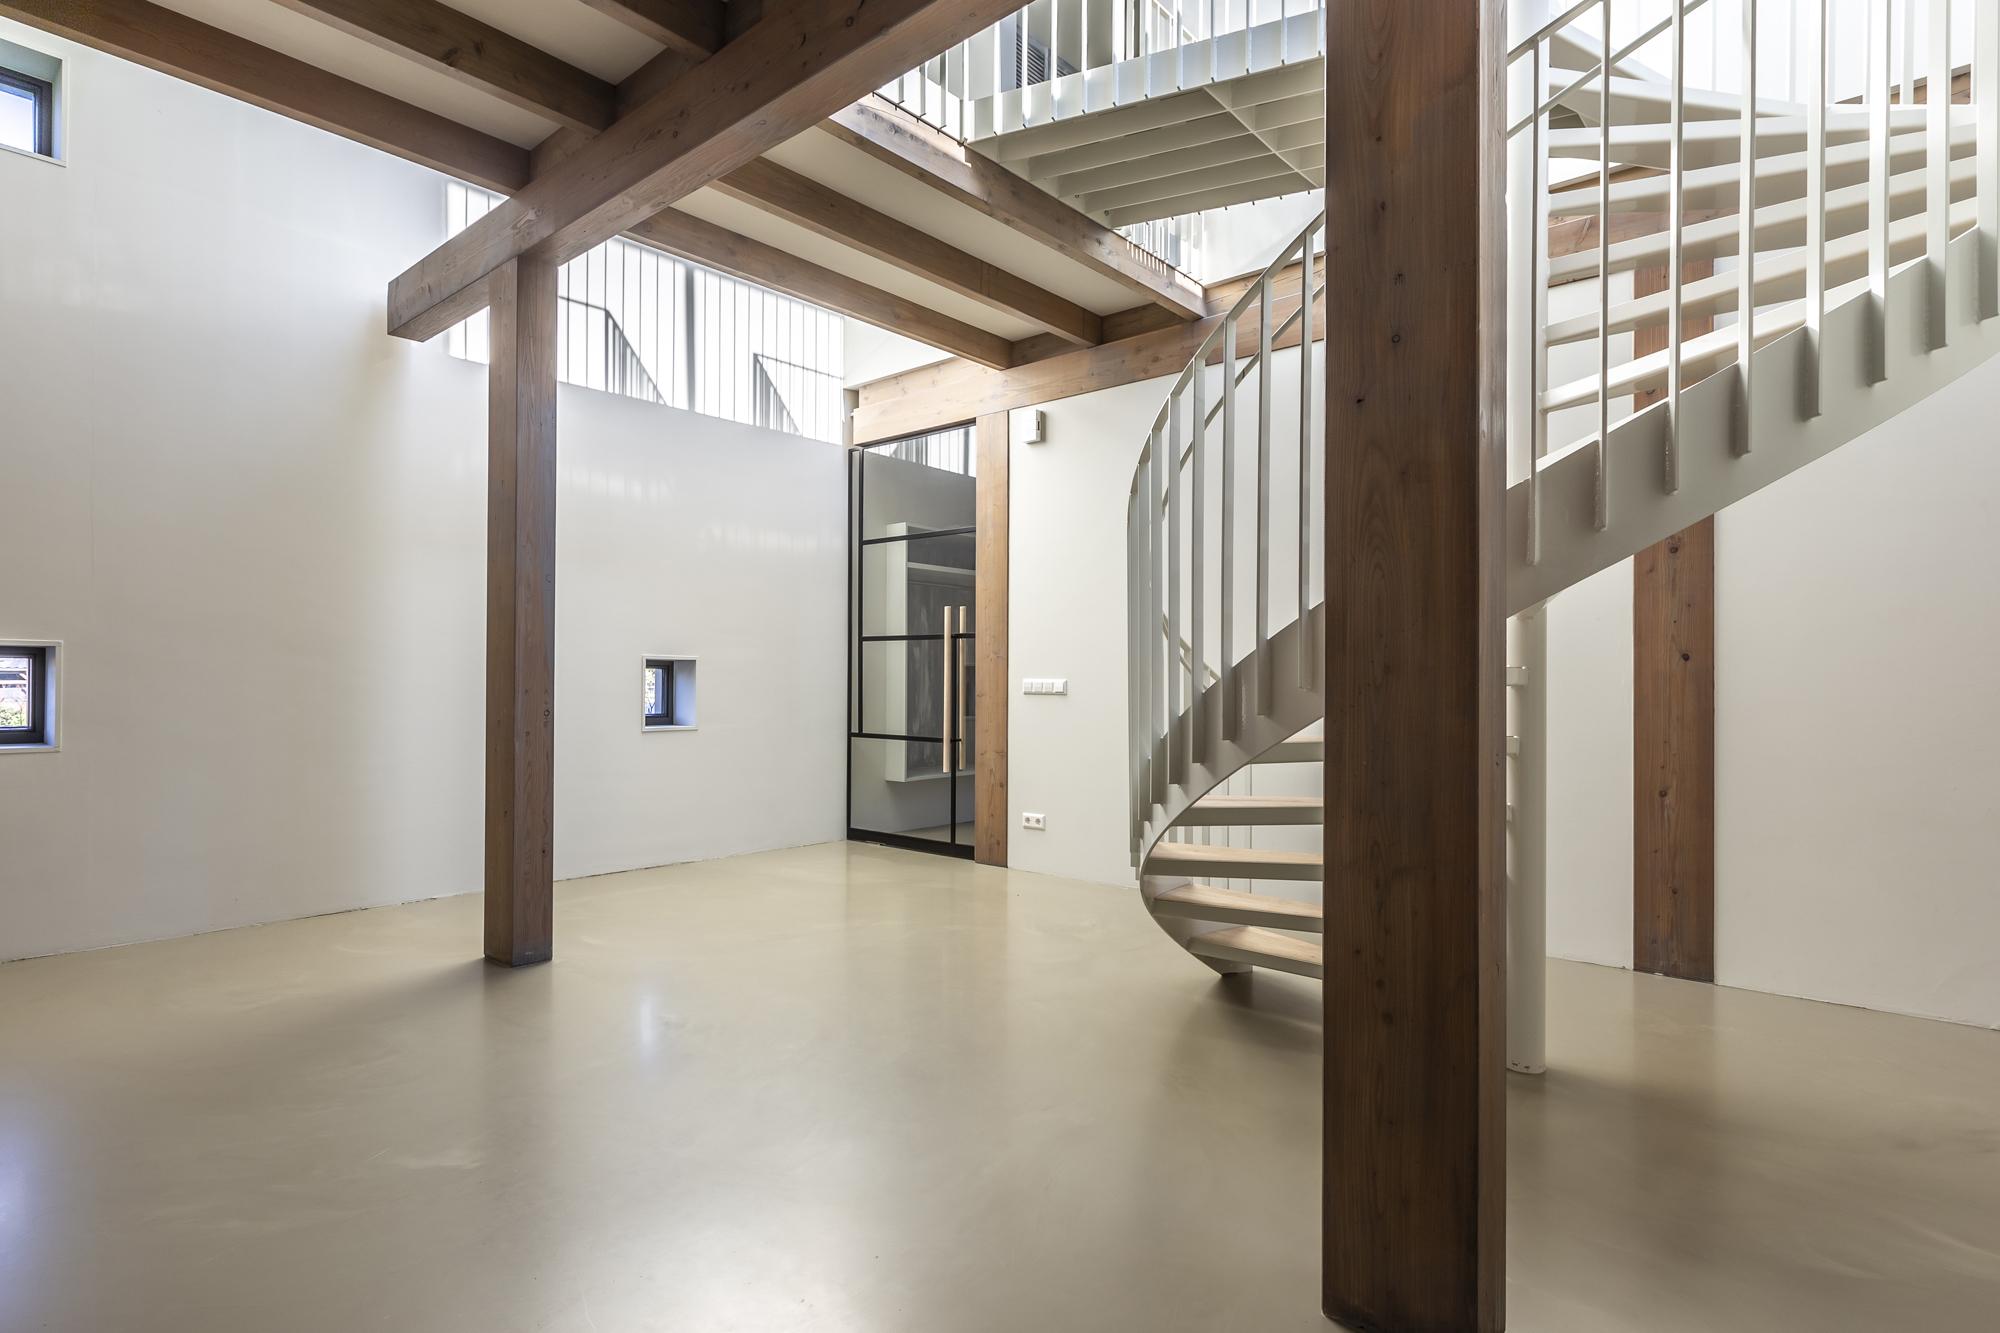 BOON ARCHITECTUUR-LONG HOUSE-2277-HDR_LR